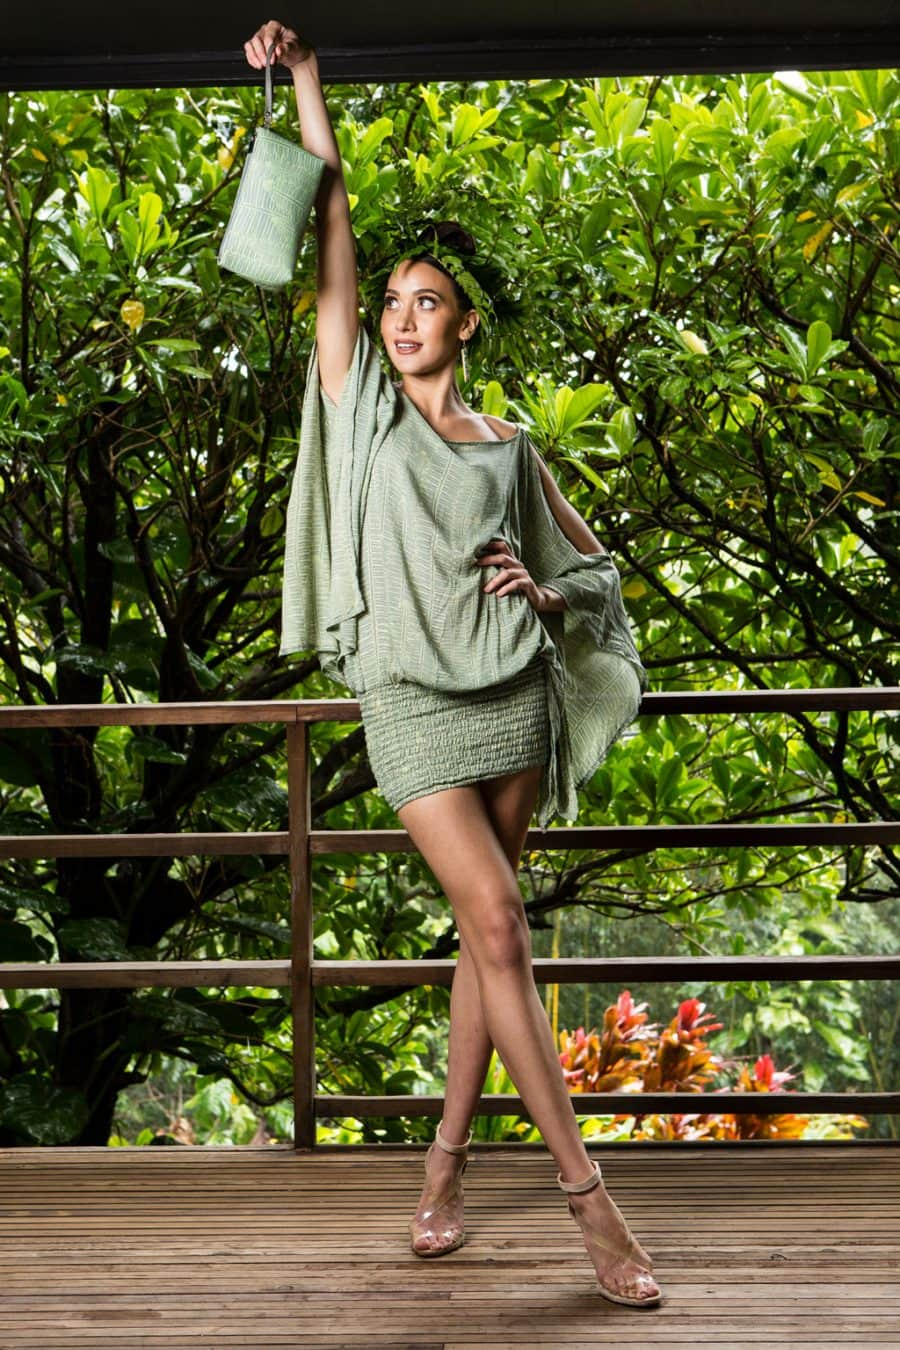 Model holding Long Zip Pouch in Margarita Lily Pad Kupukupu pattern